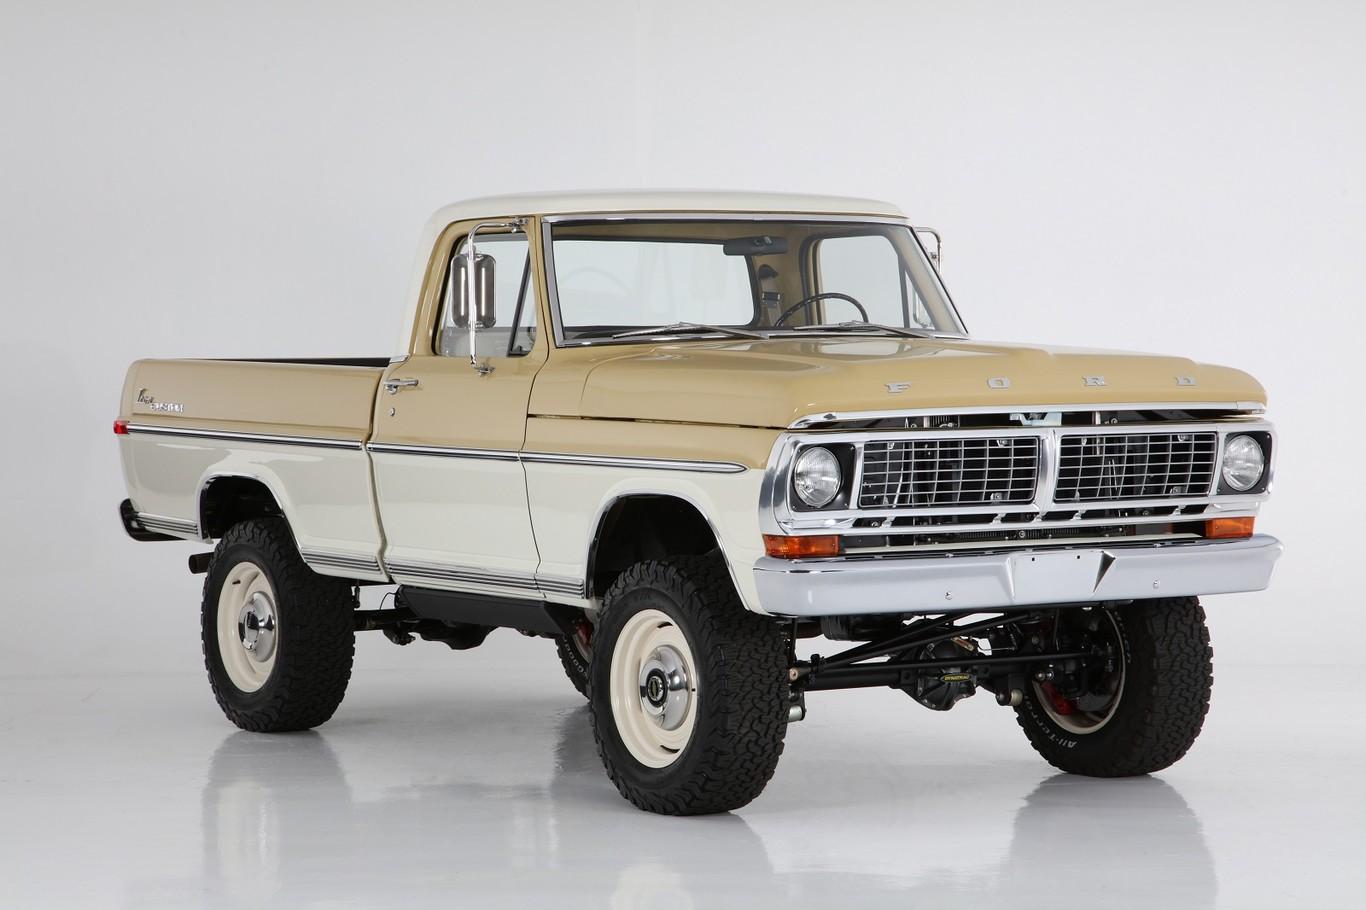 Ford Ranger 1970 Modificada Por Icon Una Preparacion Con Estilo Restomod